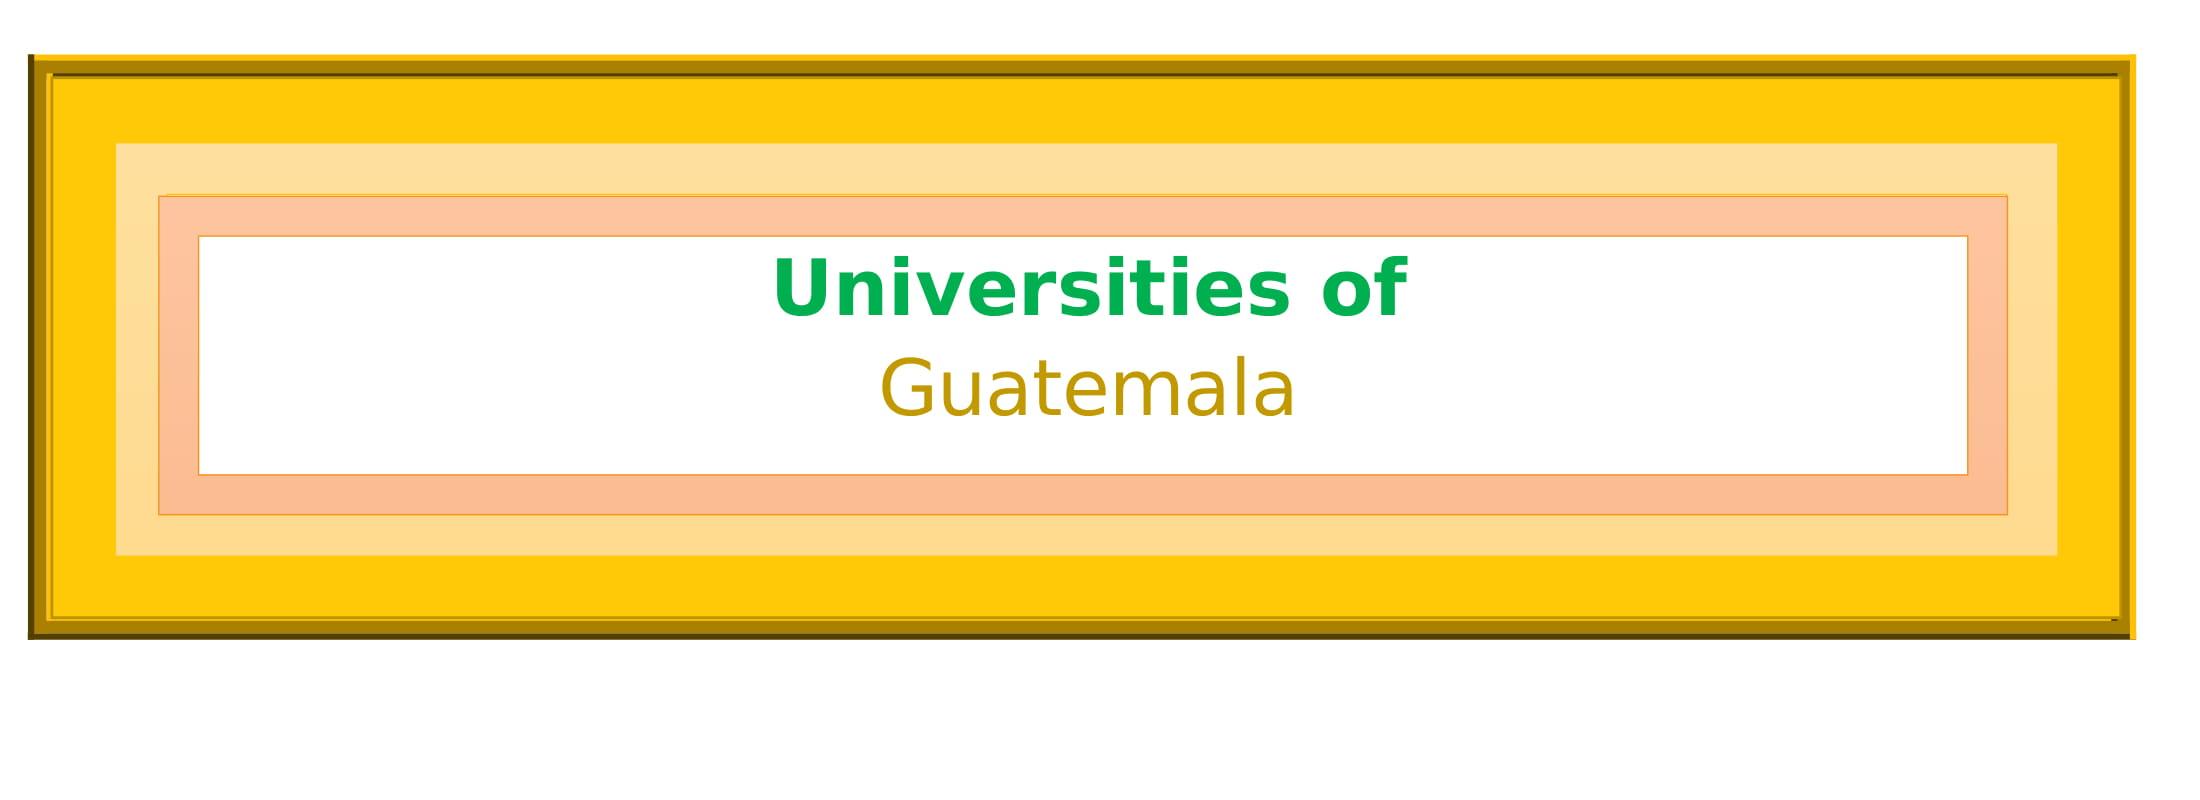 List of Universities in Guatemala